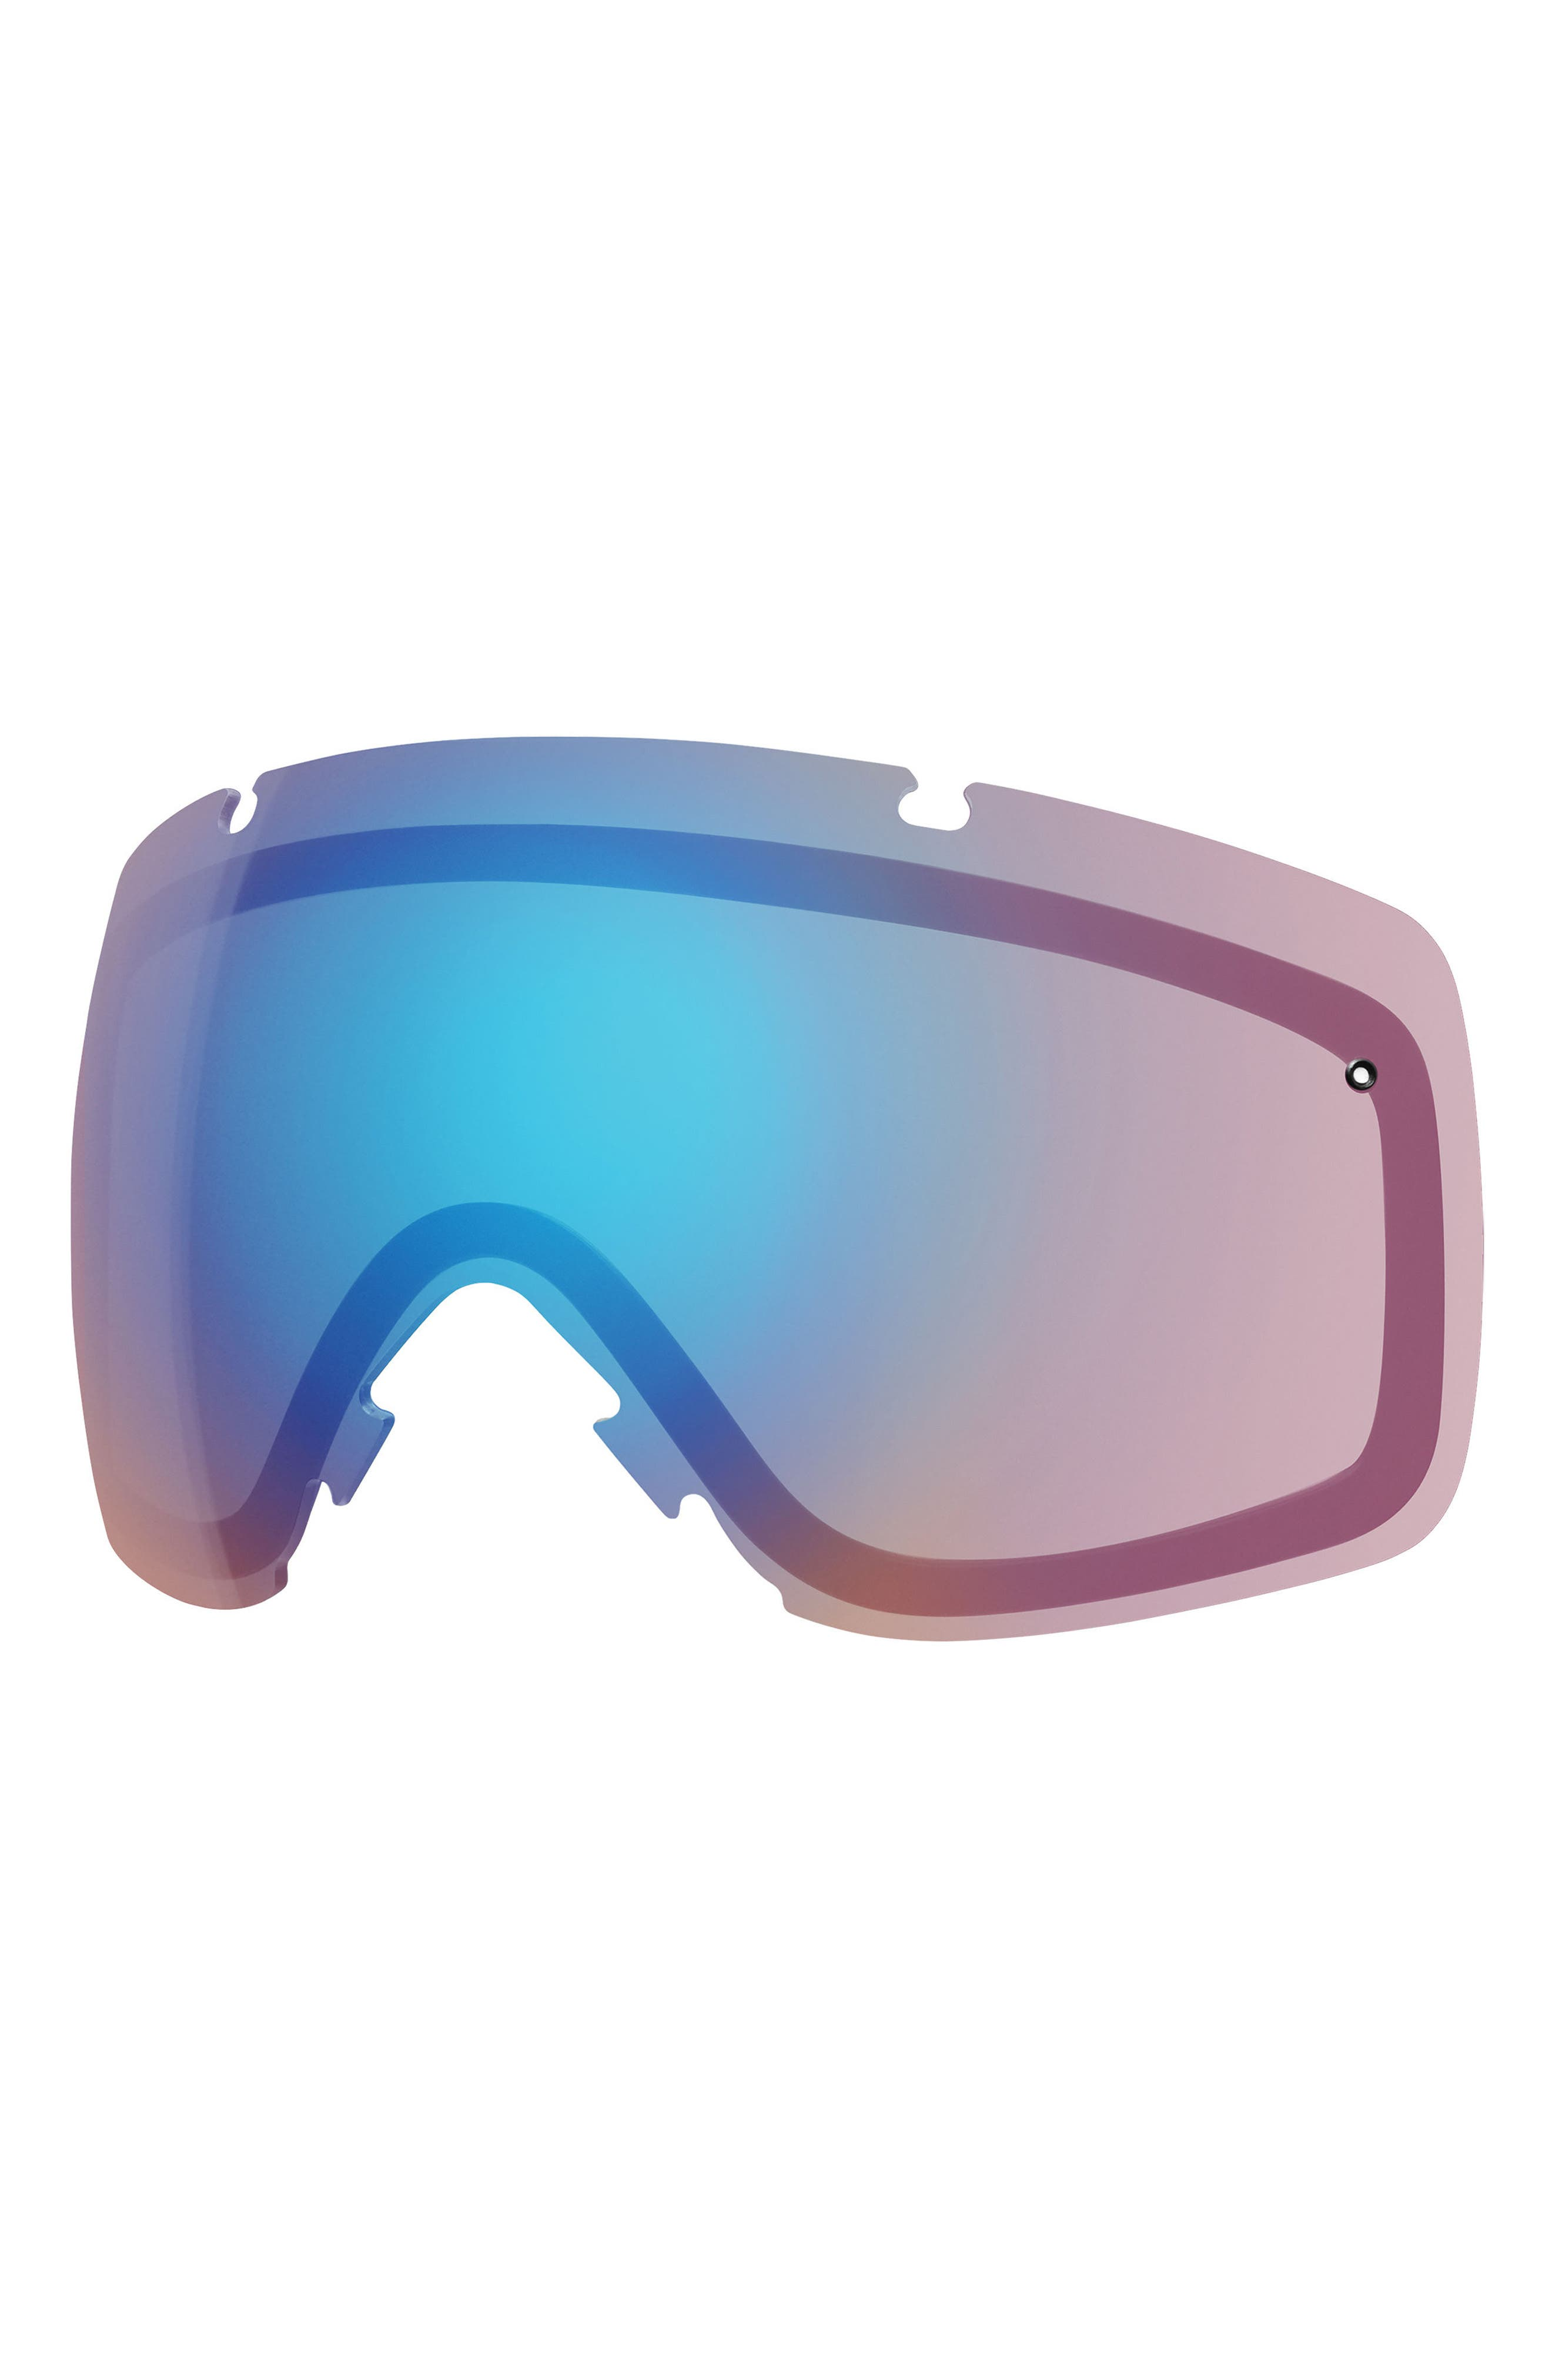 I/OX 205mm Chromapop Snow Goggles,                             Alternate thumbnail 5, color,